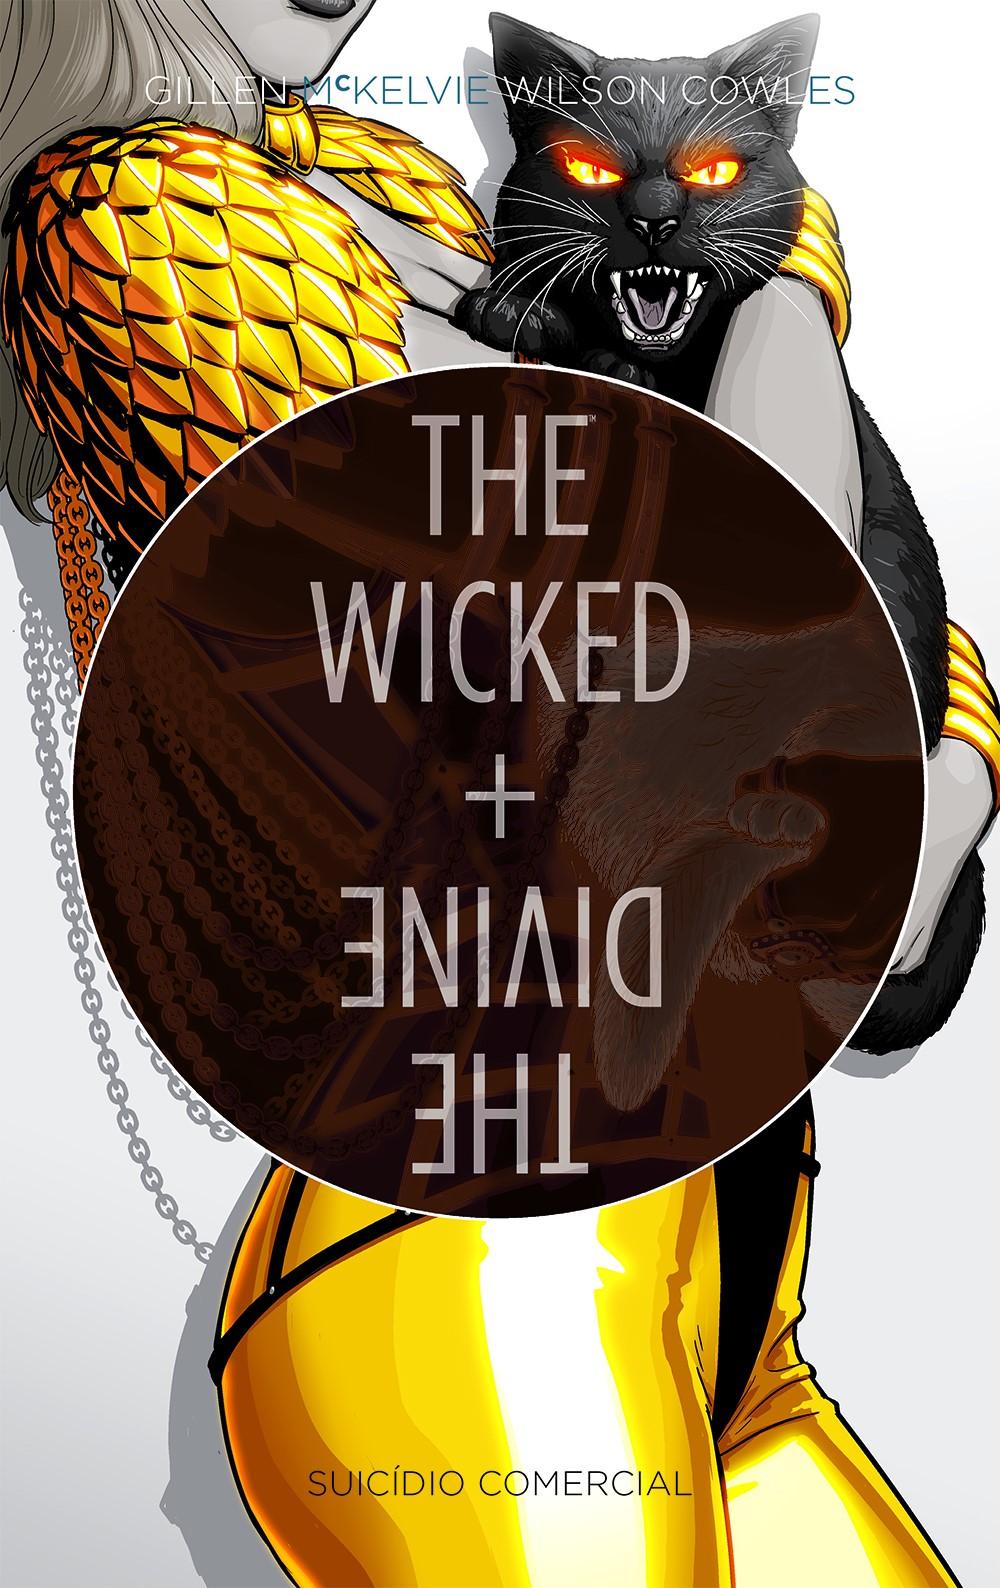 THE WICKED + THE DIVINE vol. 3: Suicídio Comercial